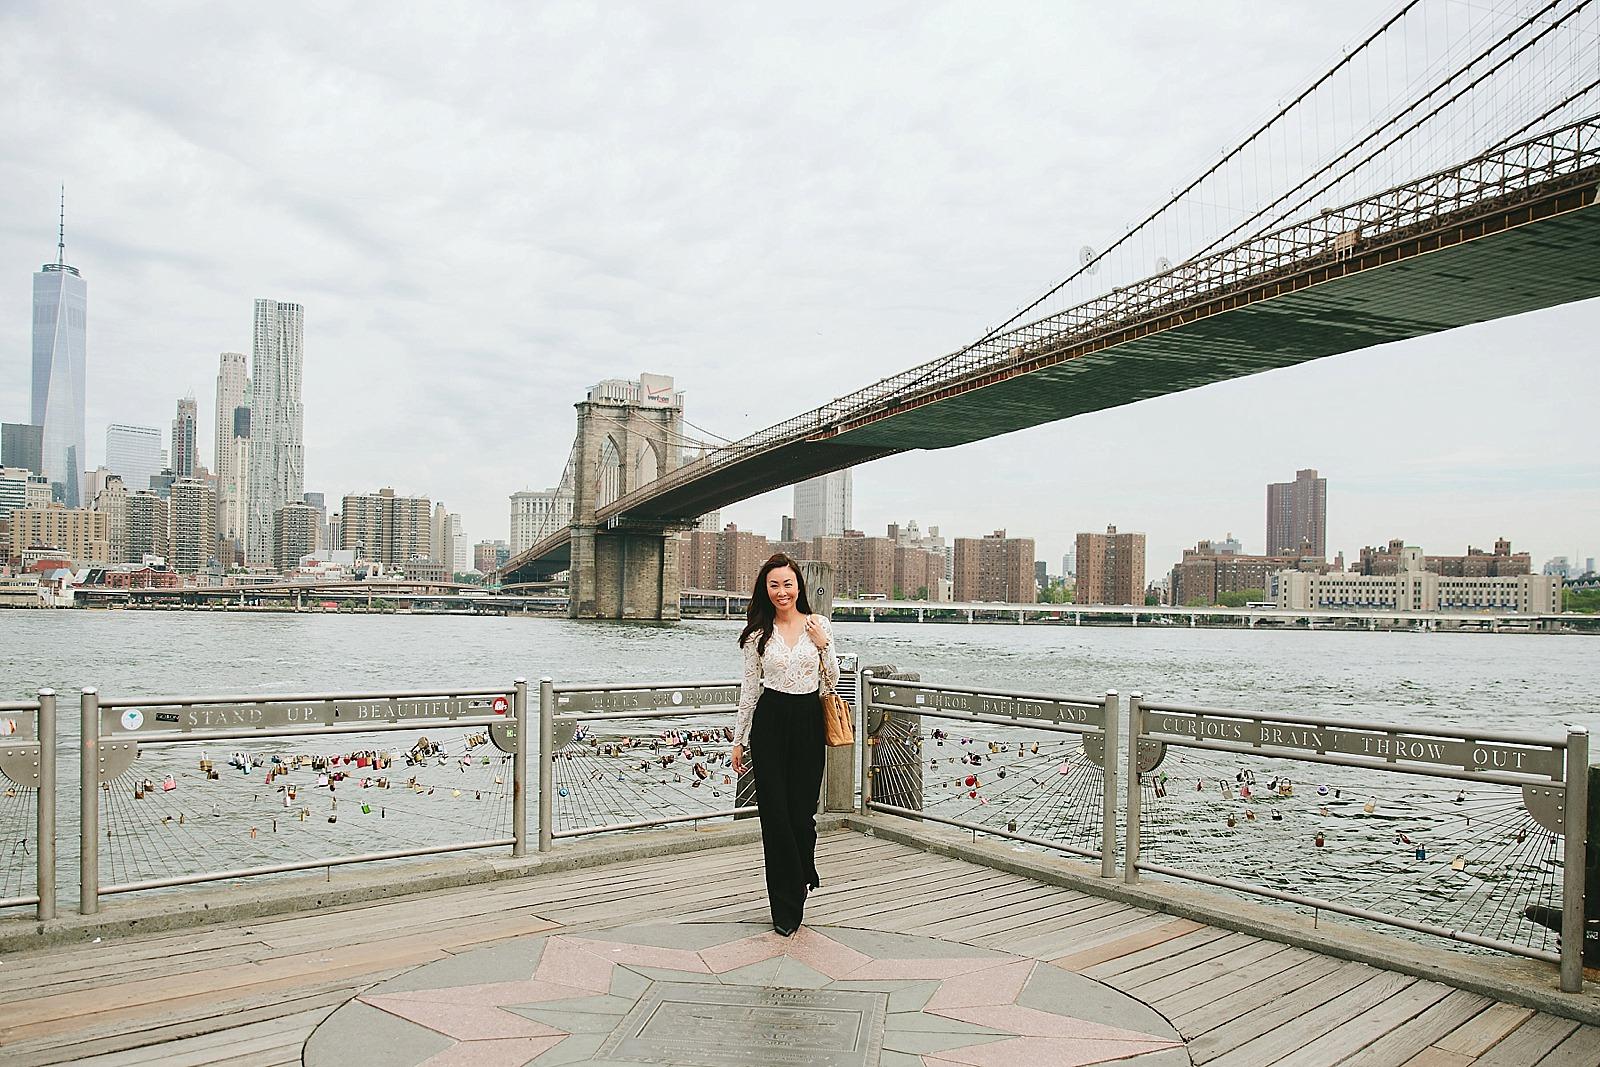 lace bodysuit black high waisted pants brooklyn bridge new york / diana elizabeth / lifestyle blogger www.dianaelizabethblog.com